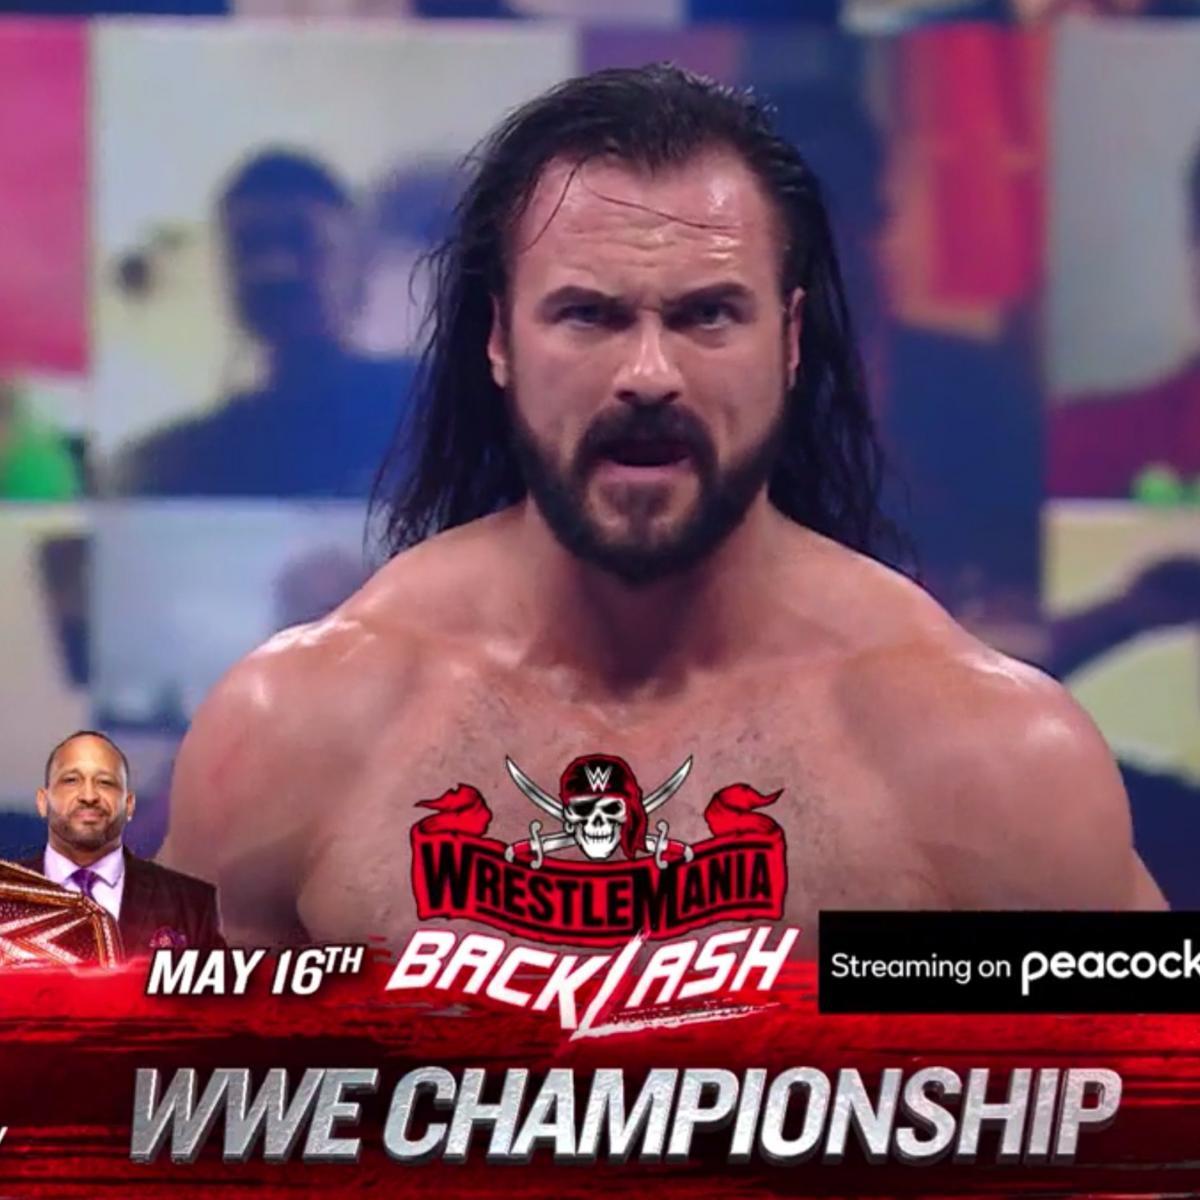 Lashley vs. McIntyre and WWE WrestleMania Backlash 2021 Match Card Predictions